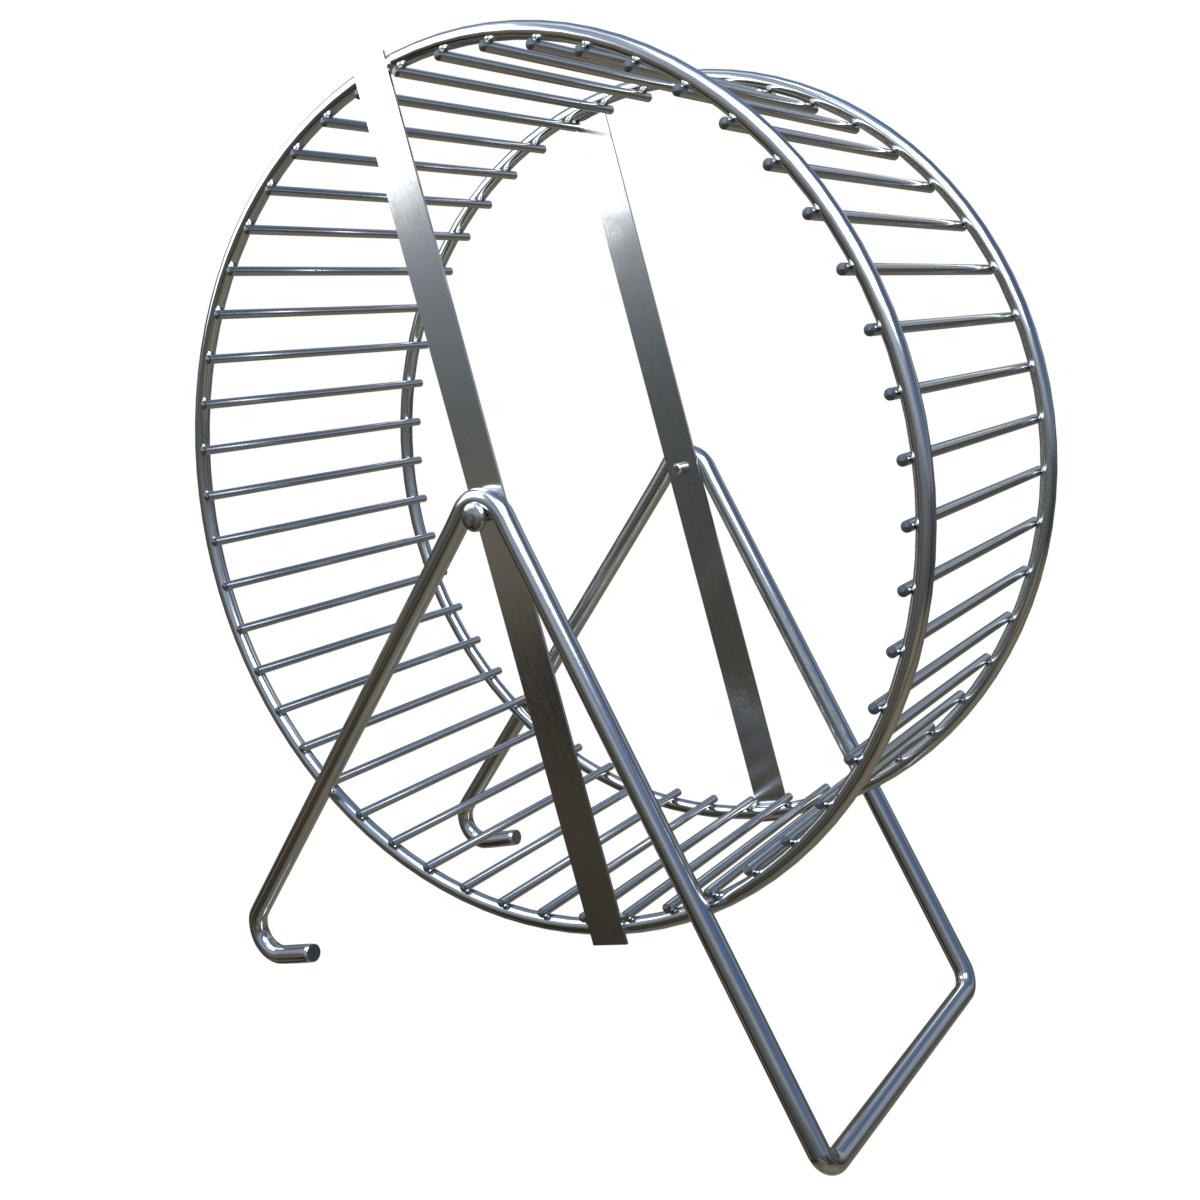 Image result for hamster wheel